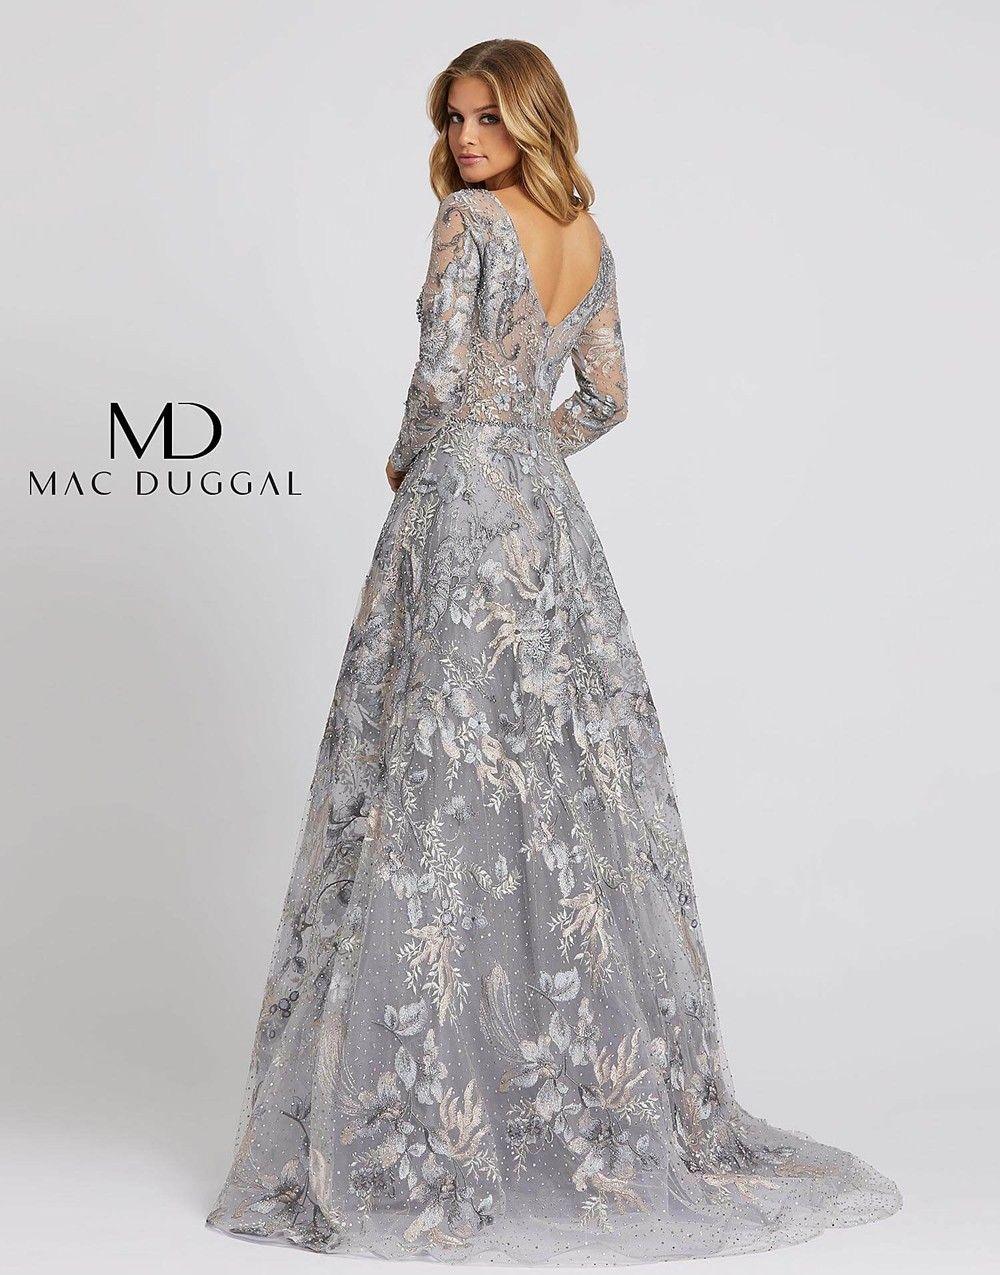 Mac Duggal 20214d Long Sleeve Embroidered Dress Long Sleeve Dress Formal Long Sleeve Embroidered Dress Mac Duggal Dresses [ 1275 x 1000 Pixel ]